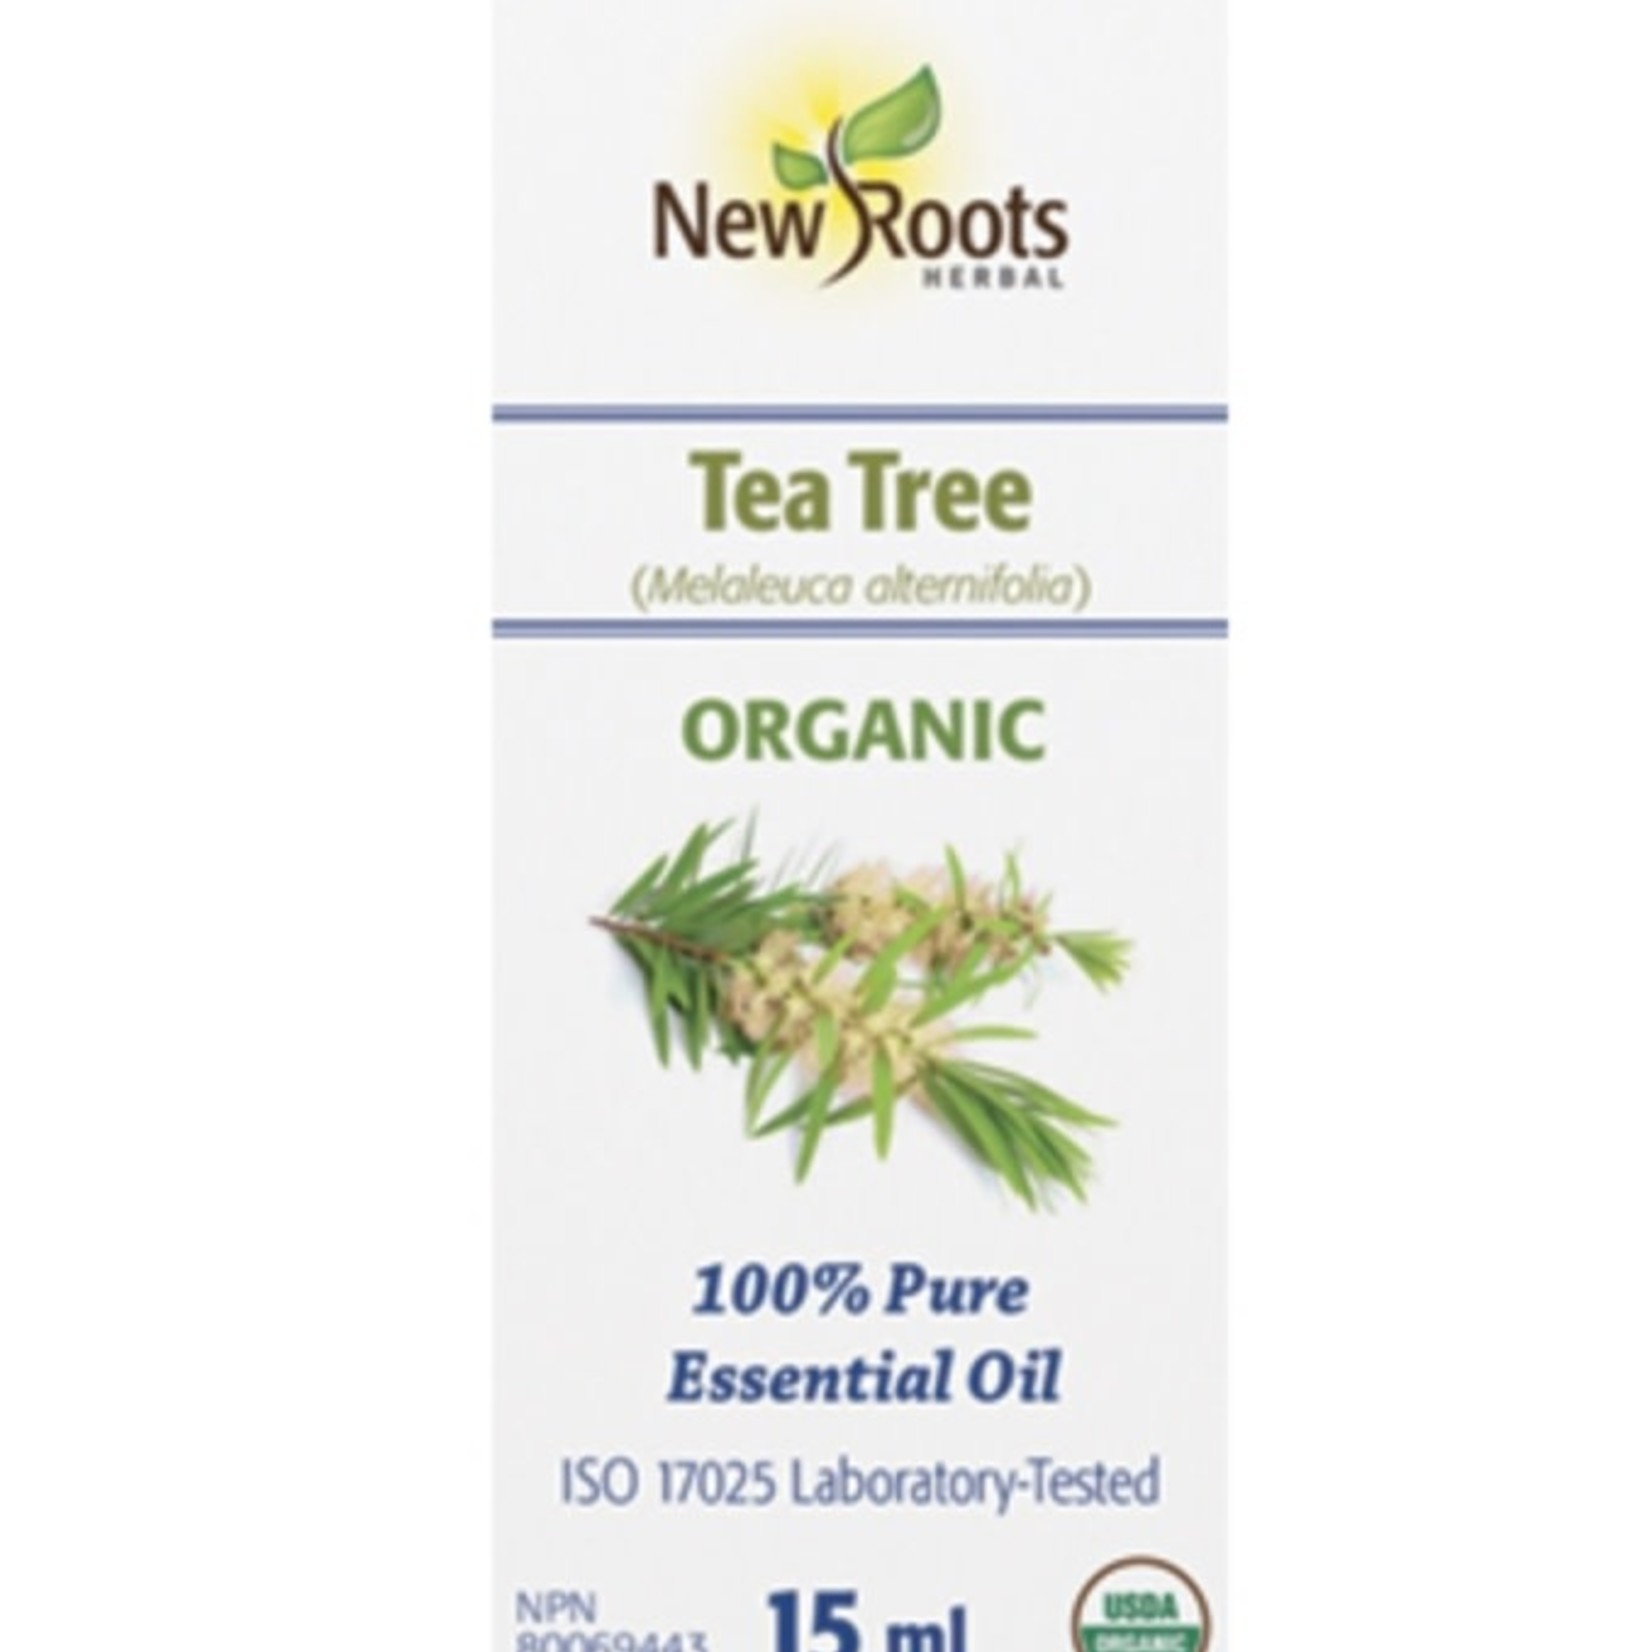 New Roots New Roots Organic Tea Tree Essential Oil 15ml